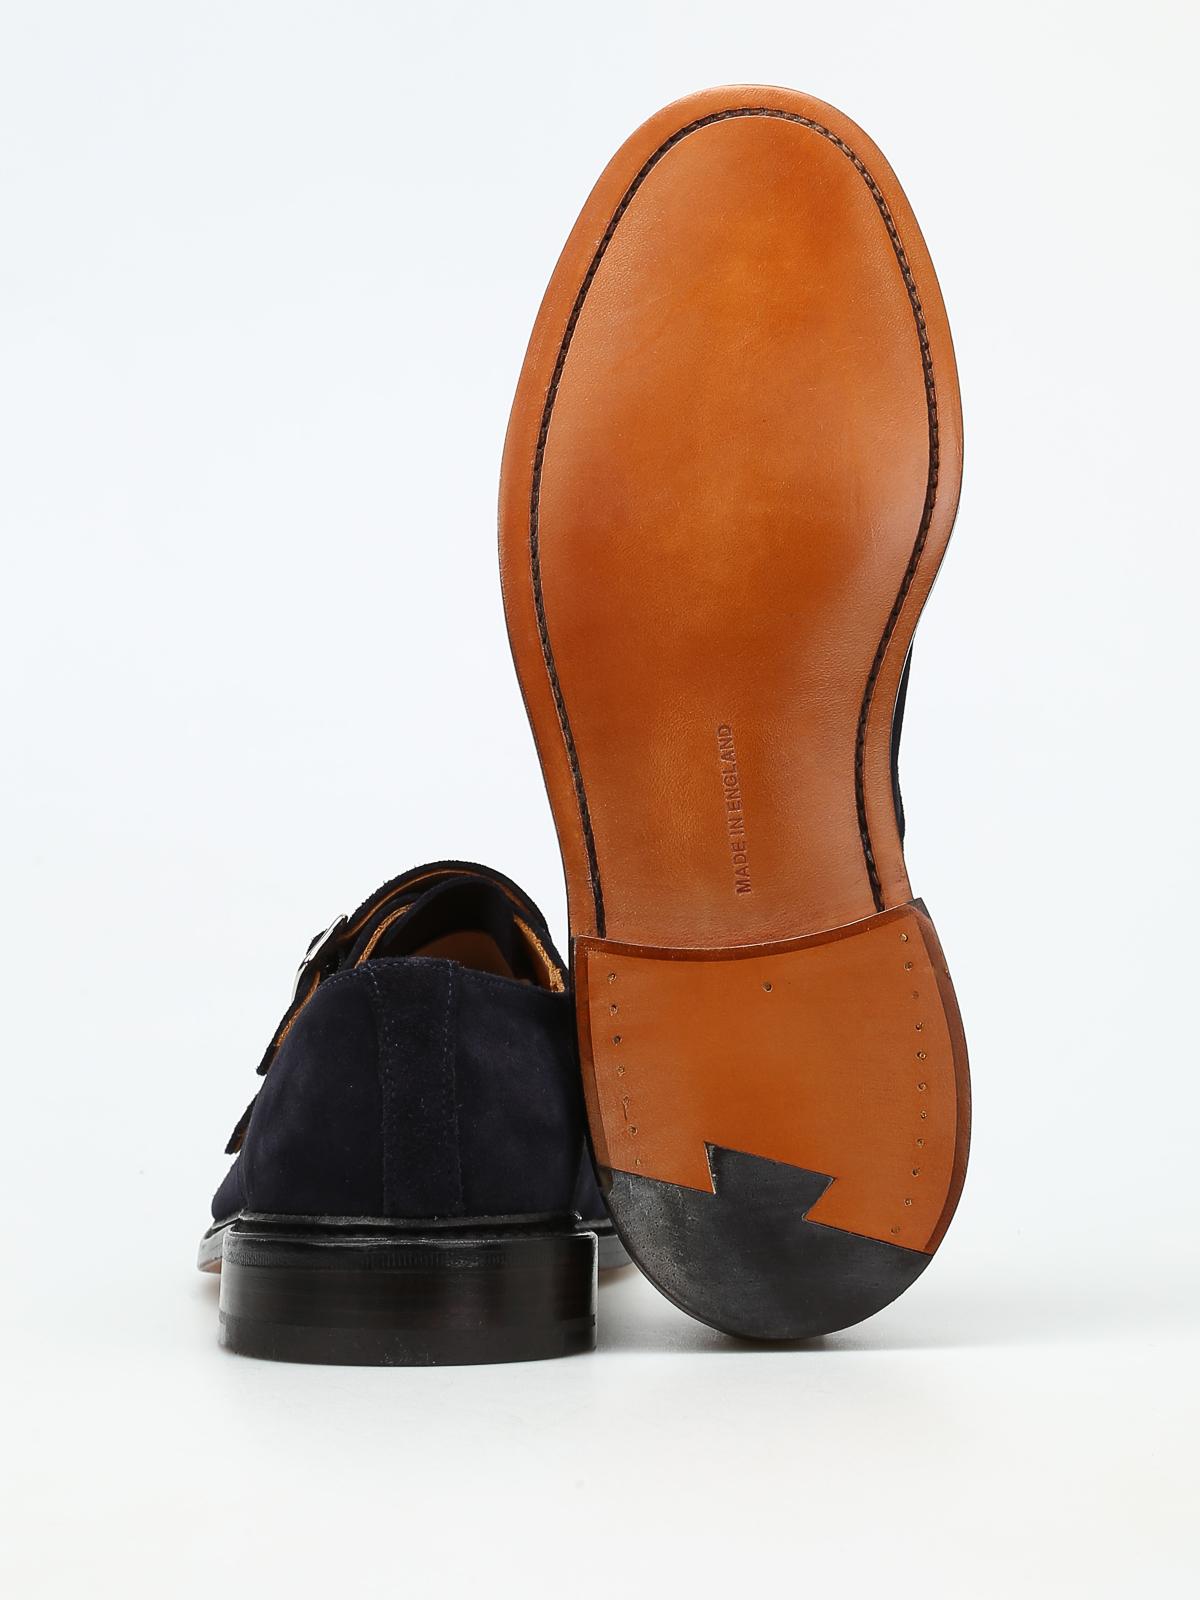 Tricker's Rufus Homme Chaussures Homme Tricker's Pour Rufus Tricker's Chaussures Pour LqR345Aj